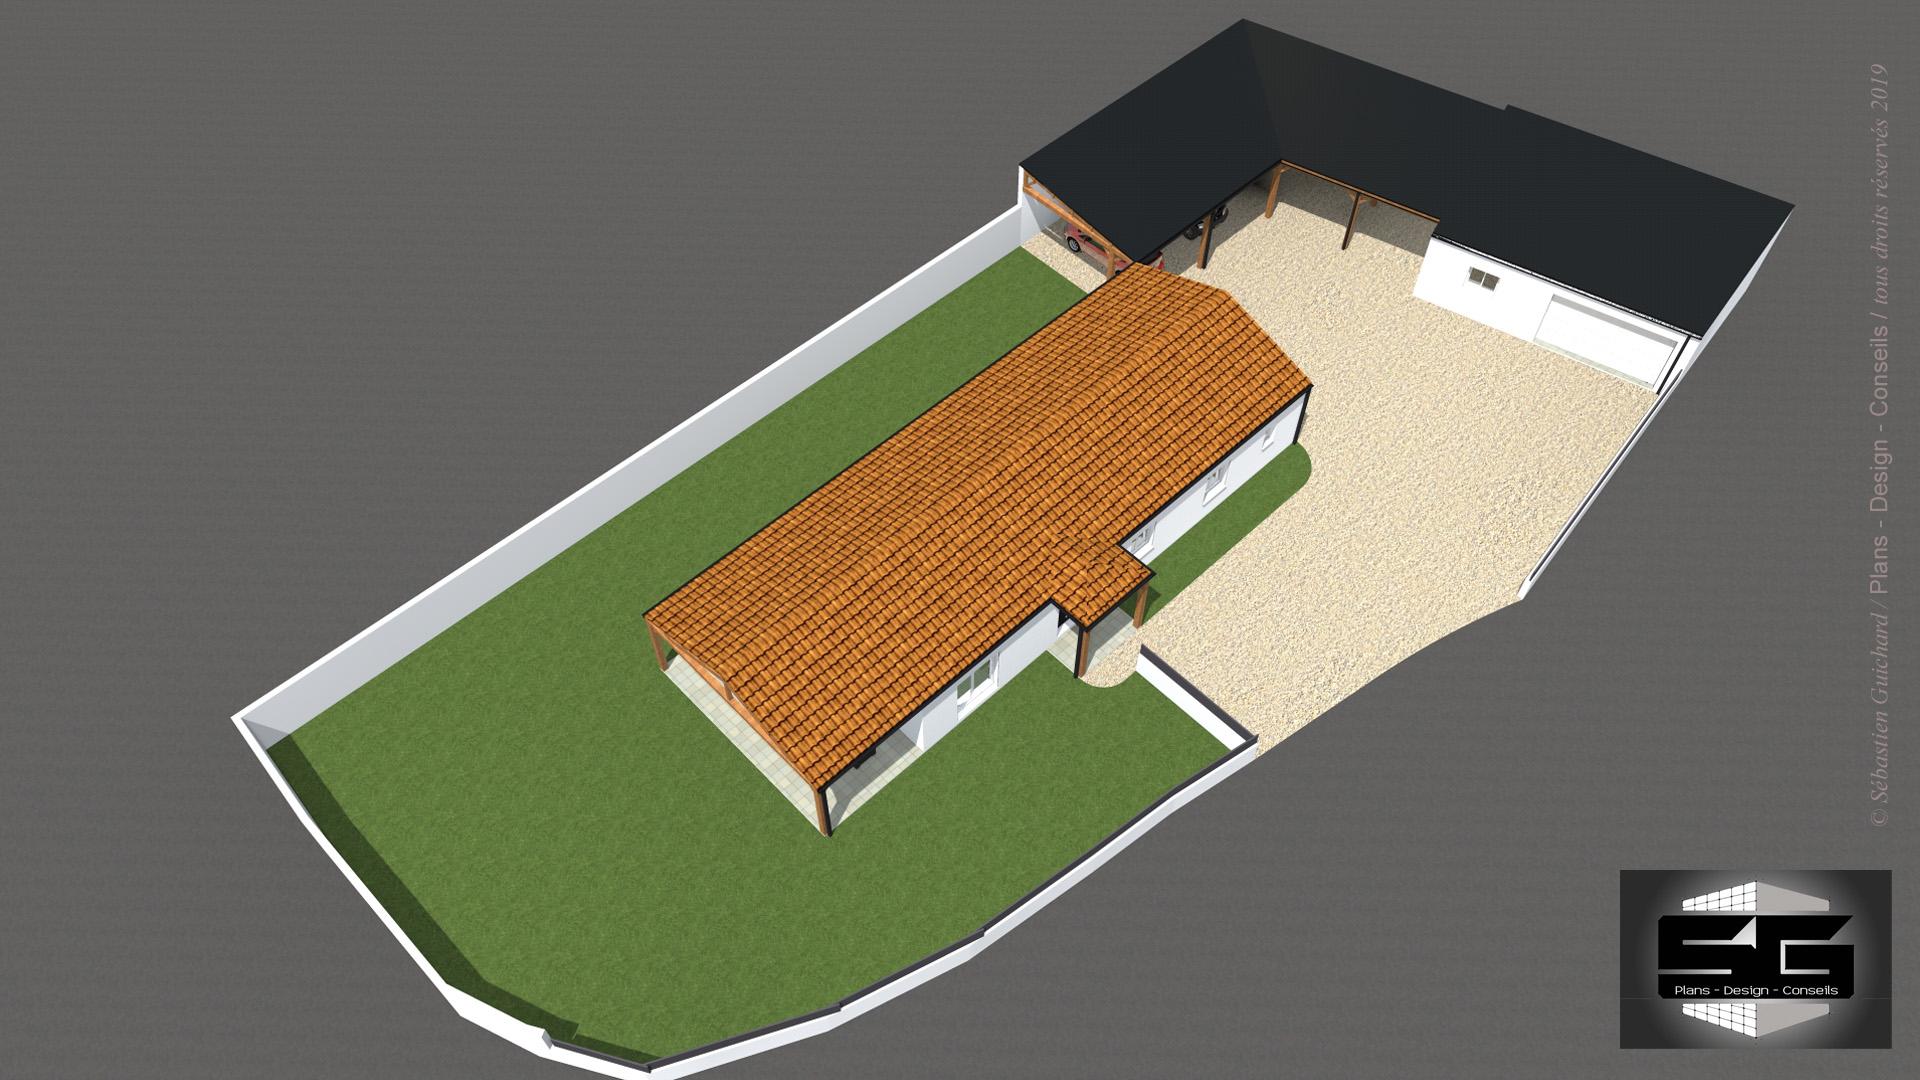 Plans_-_Design_-_Conseils_-_Jaspierre_-_